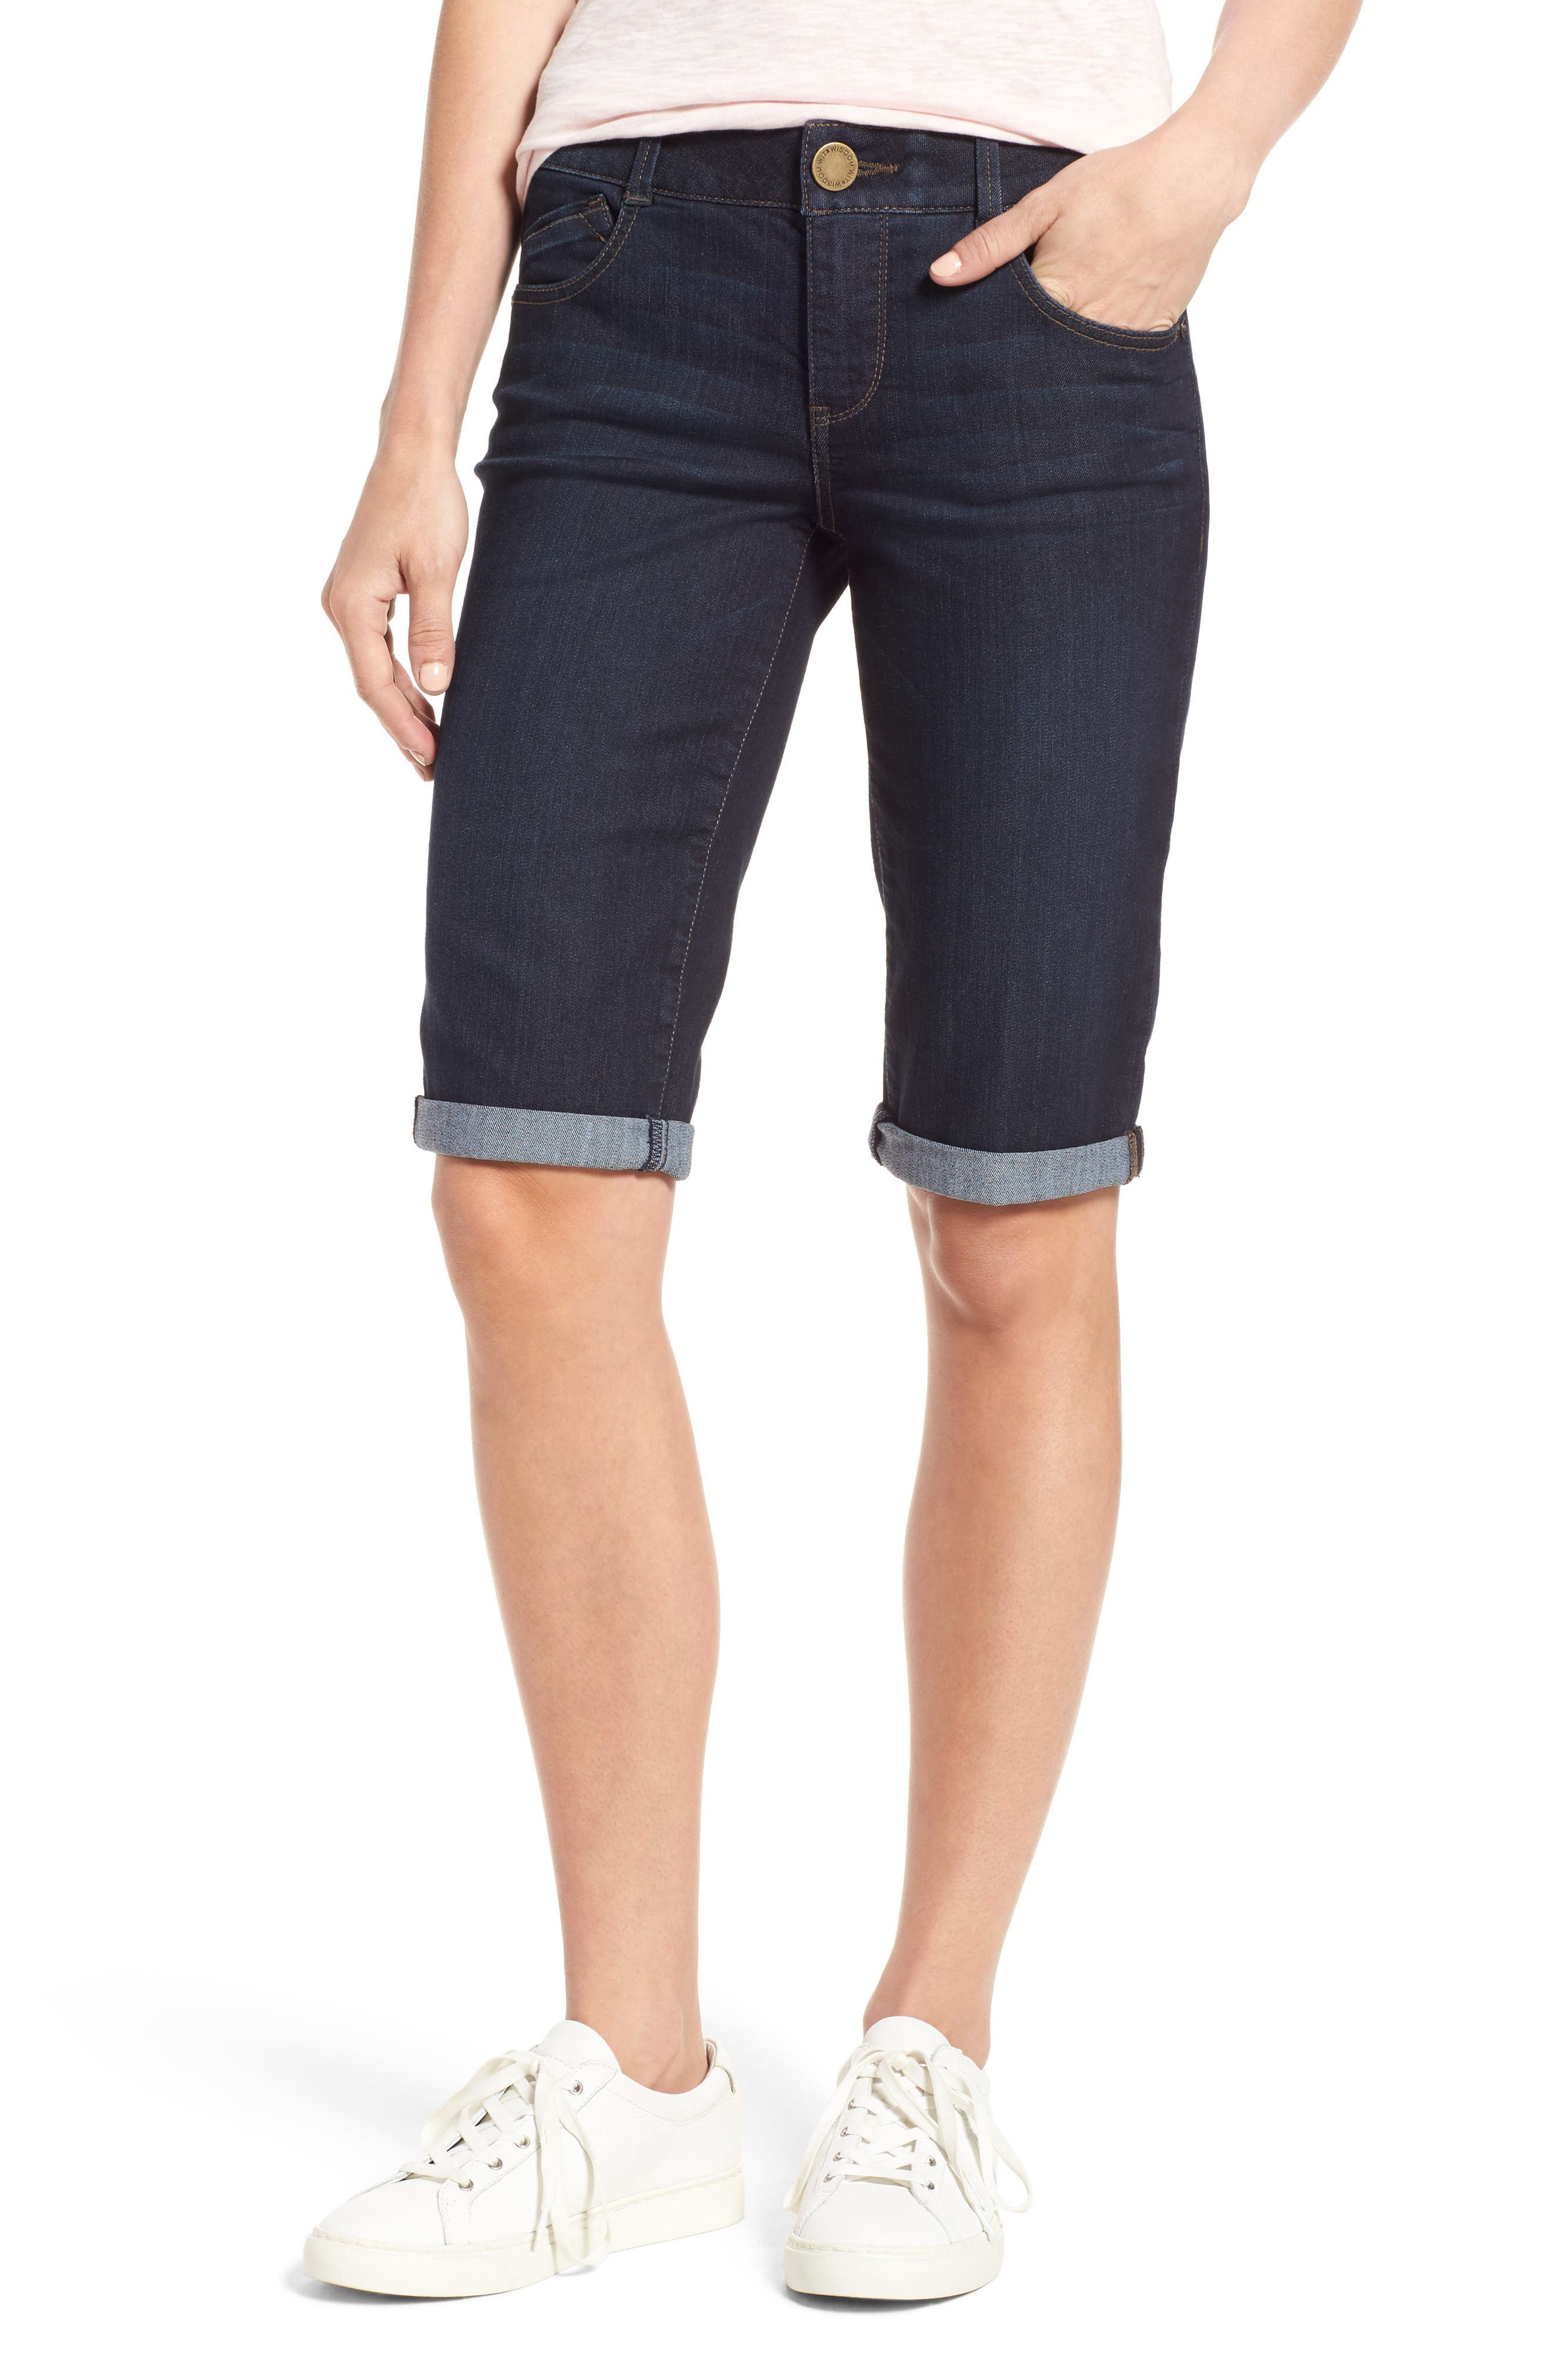 Petite Women's Wit & Wisdom Ab-Solution Denim Bermuda Shorts